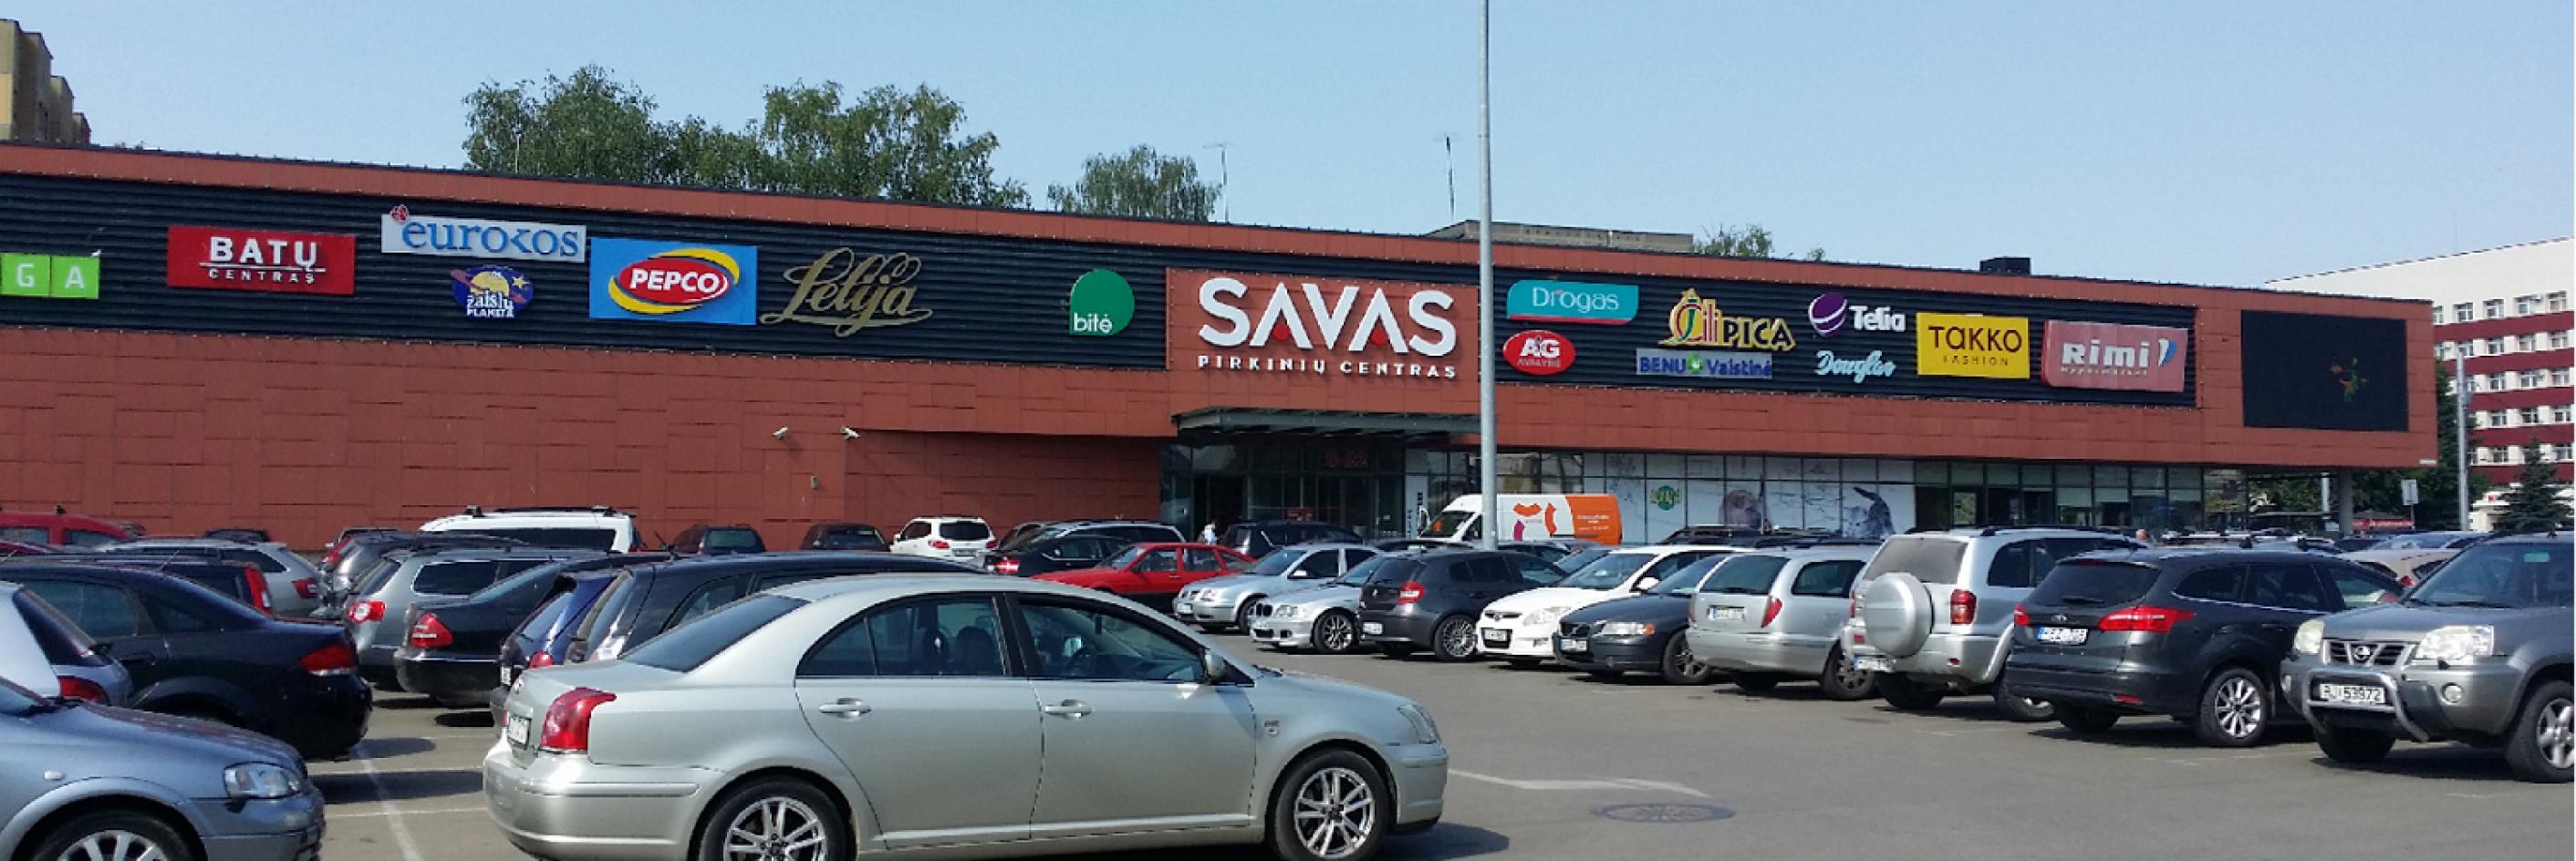 Savas-2824x944_2